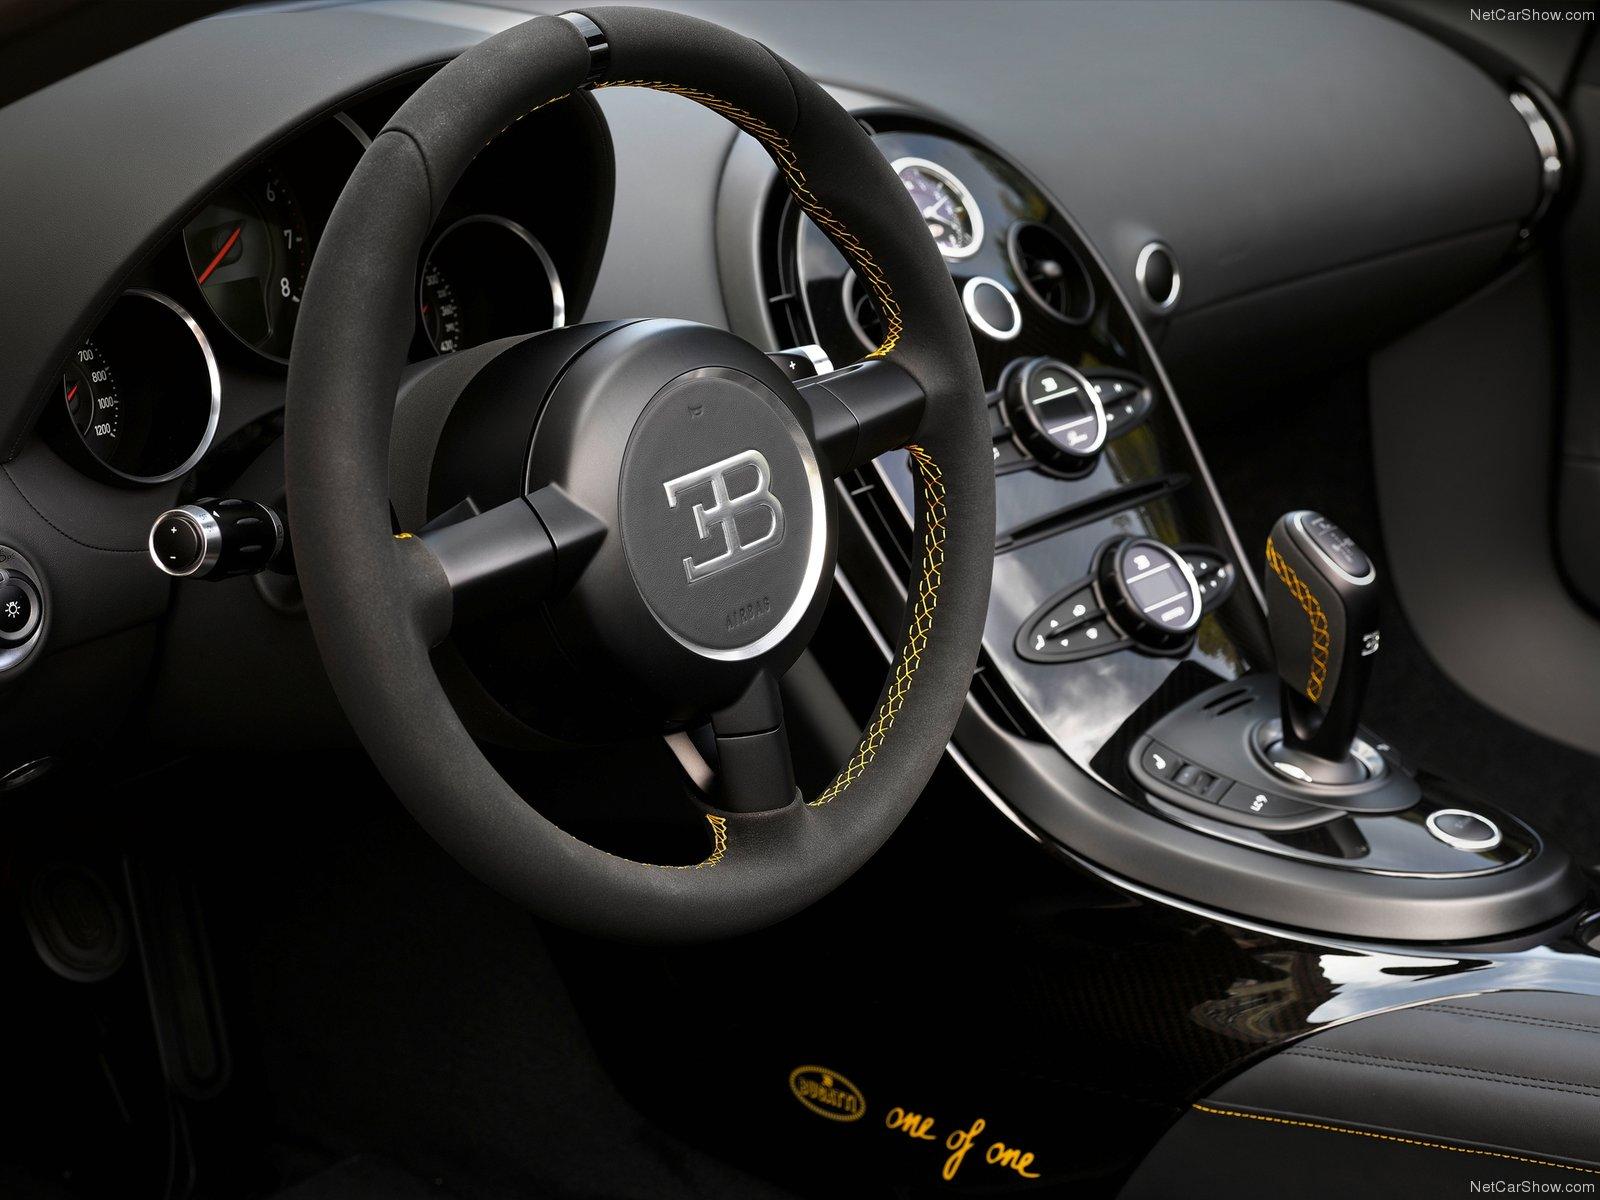 2014%2BBugatti%2BVeyron%2BGrand%2BSport%2BVitesse%2B1of1%2B%25285%2529 Astounding Xe Bugatti Veyron Grand Sport Vitesse Cars Trend